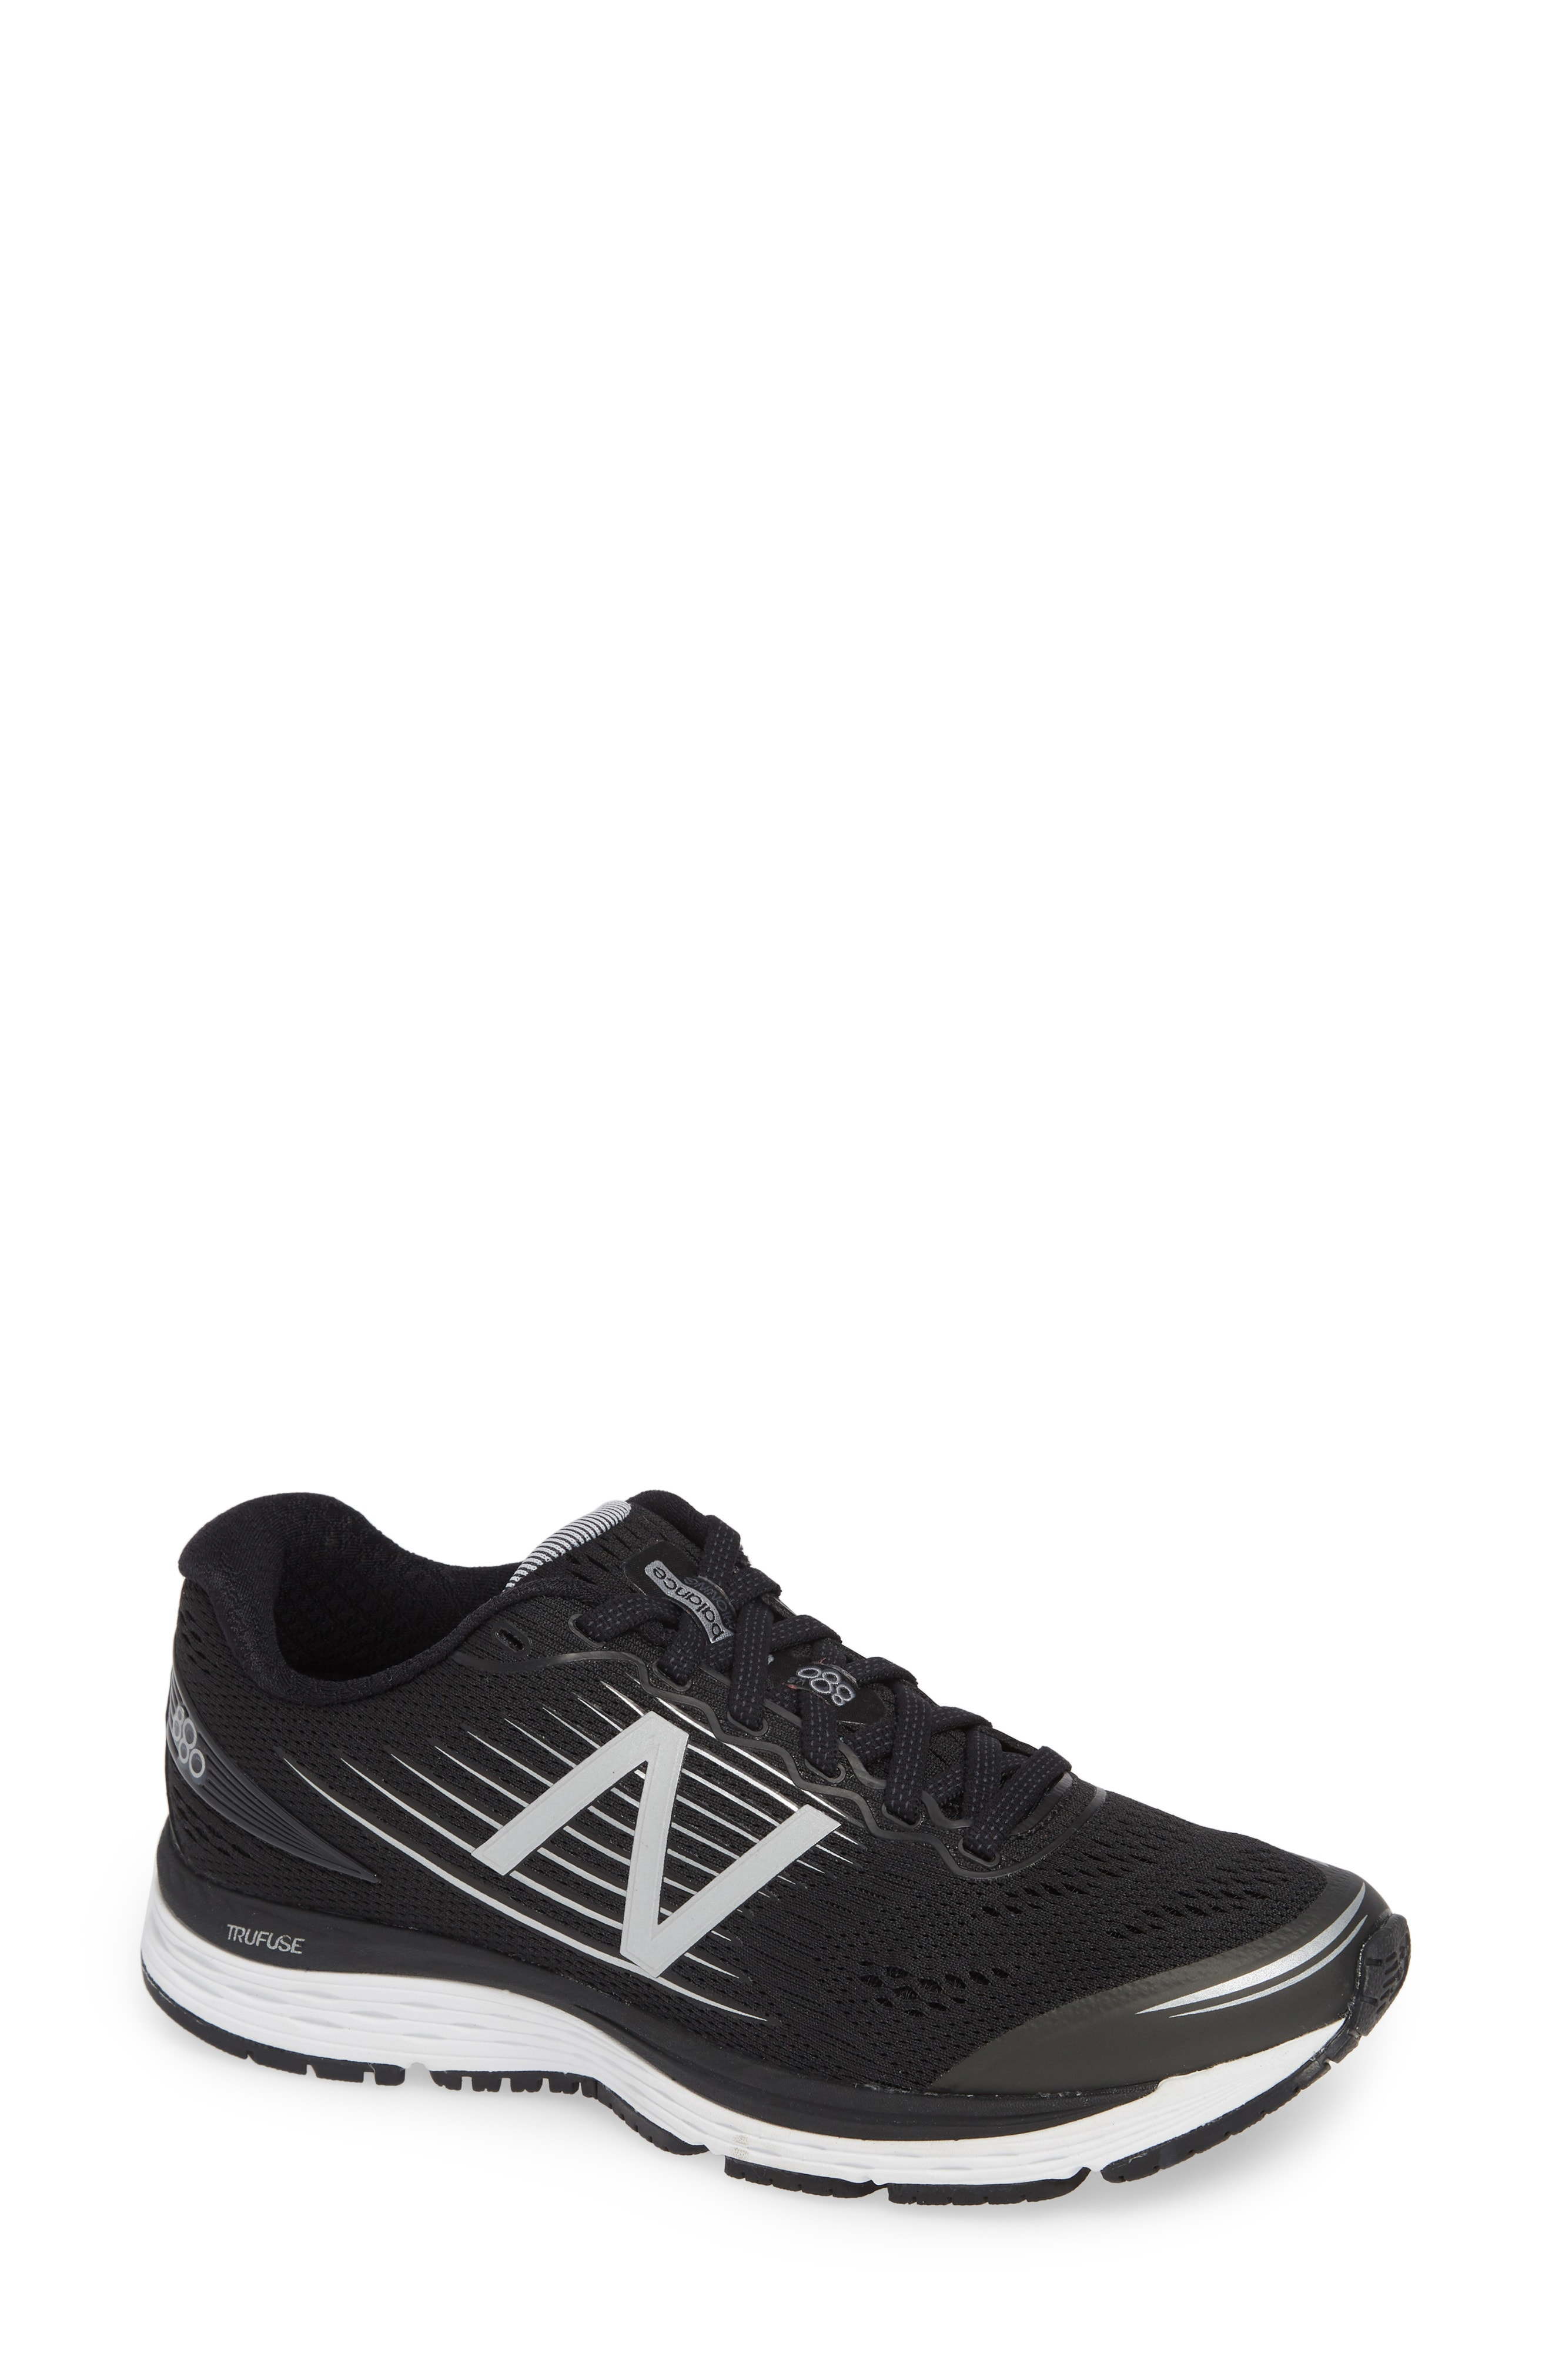 New Balance 880v8 Running Shoe (Women)